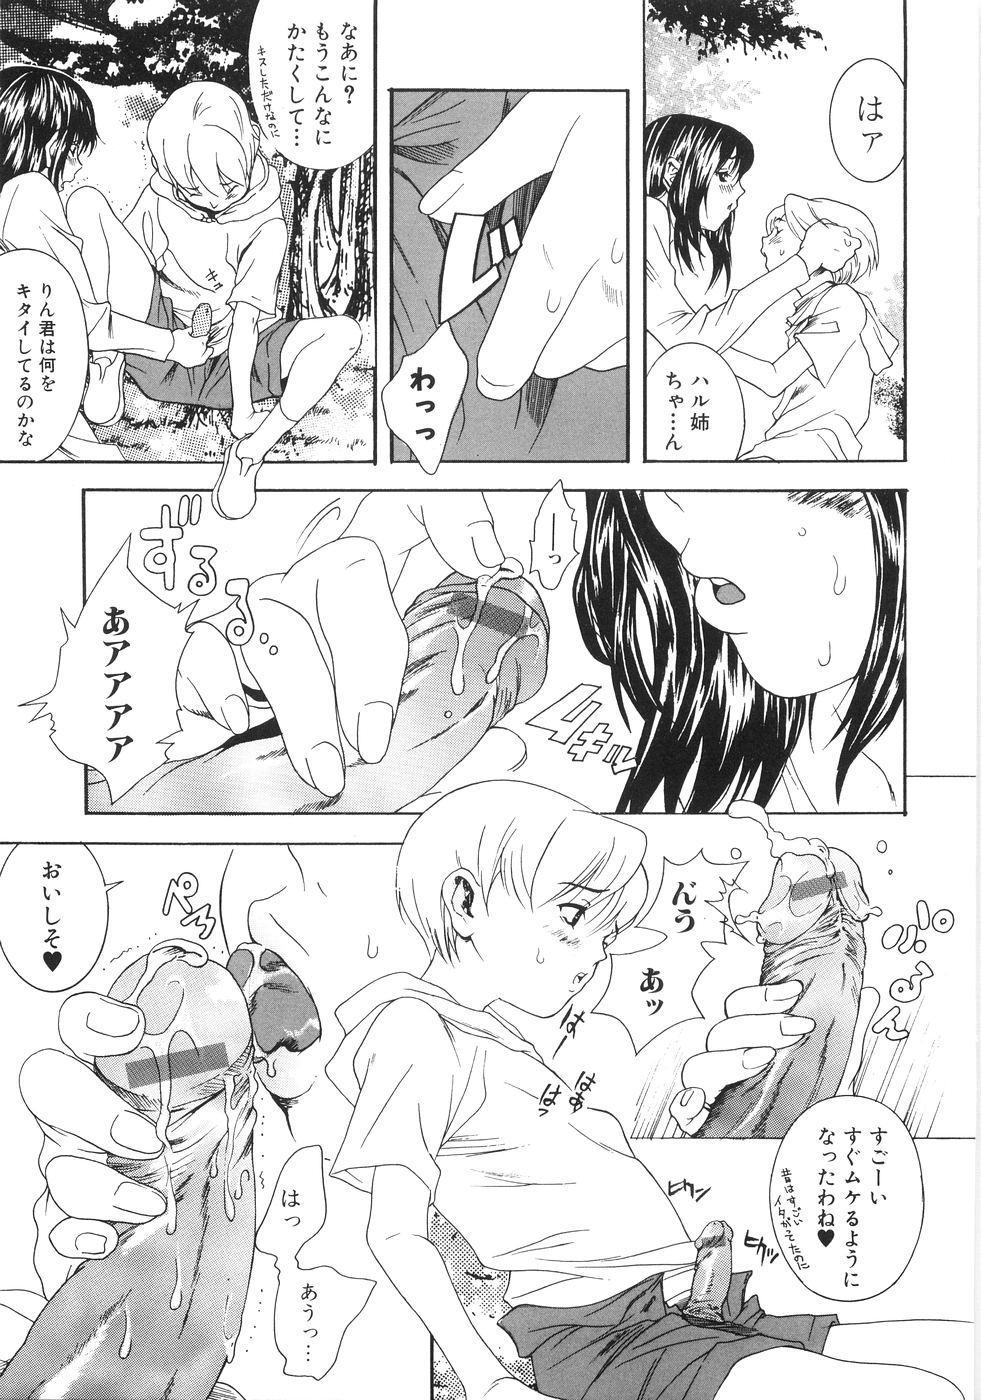 Honki Jiru - Cowper's Gland Liquid? or Love Juice?...?! 85